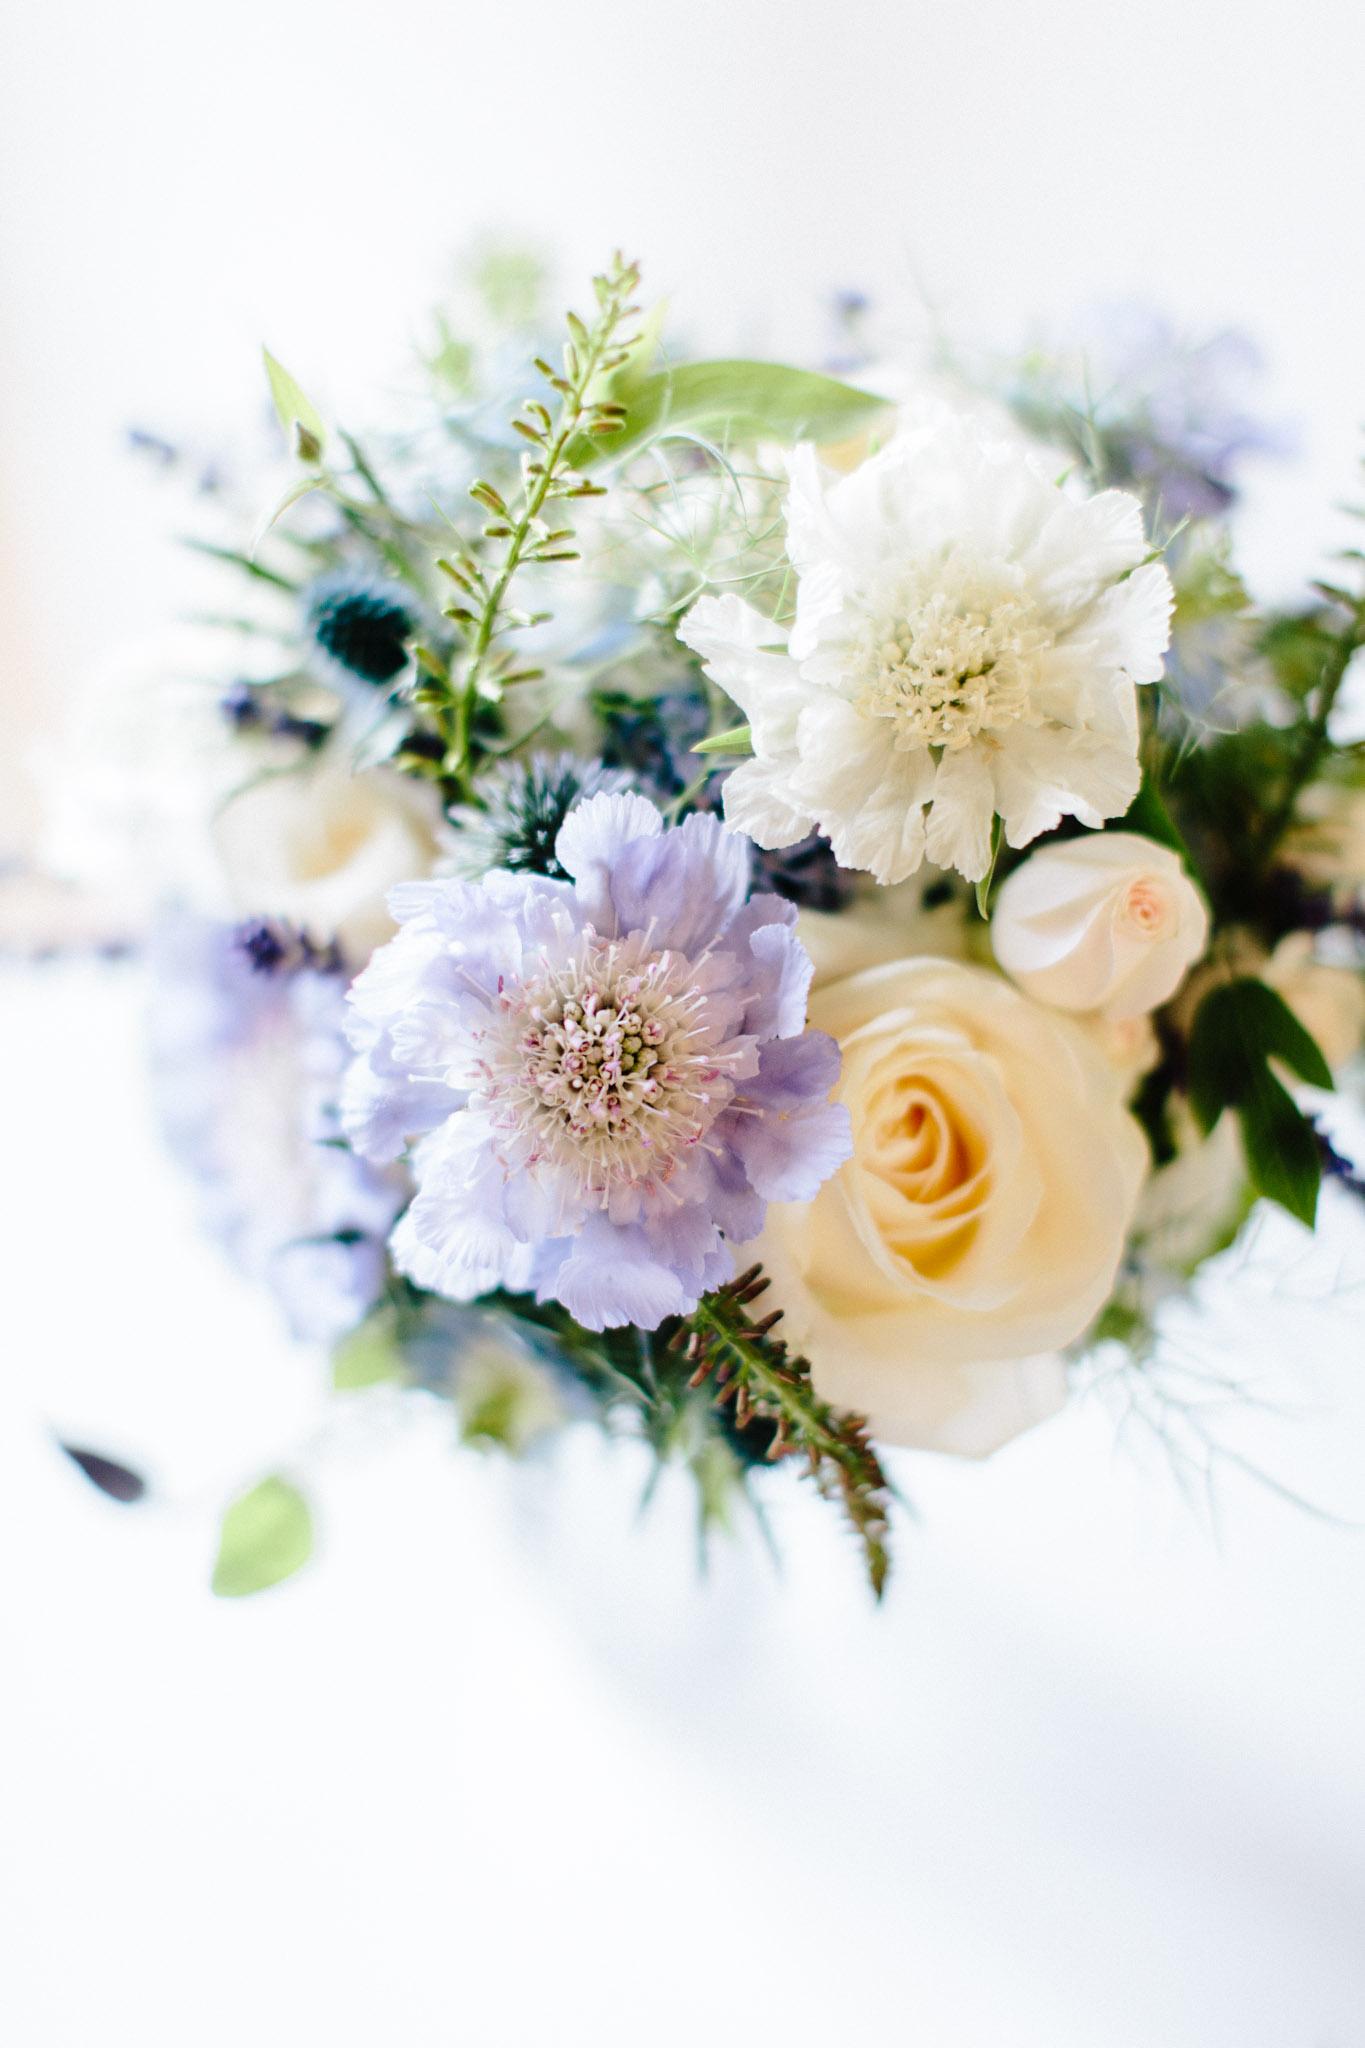 Lenl-Simmental-Buehlerhof-Pia-Anna-Christian-Wedding-Photography-EK-6.jpg